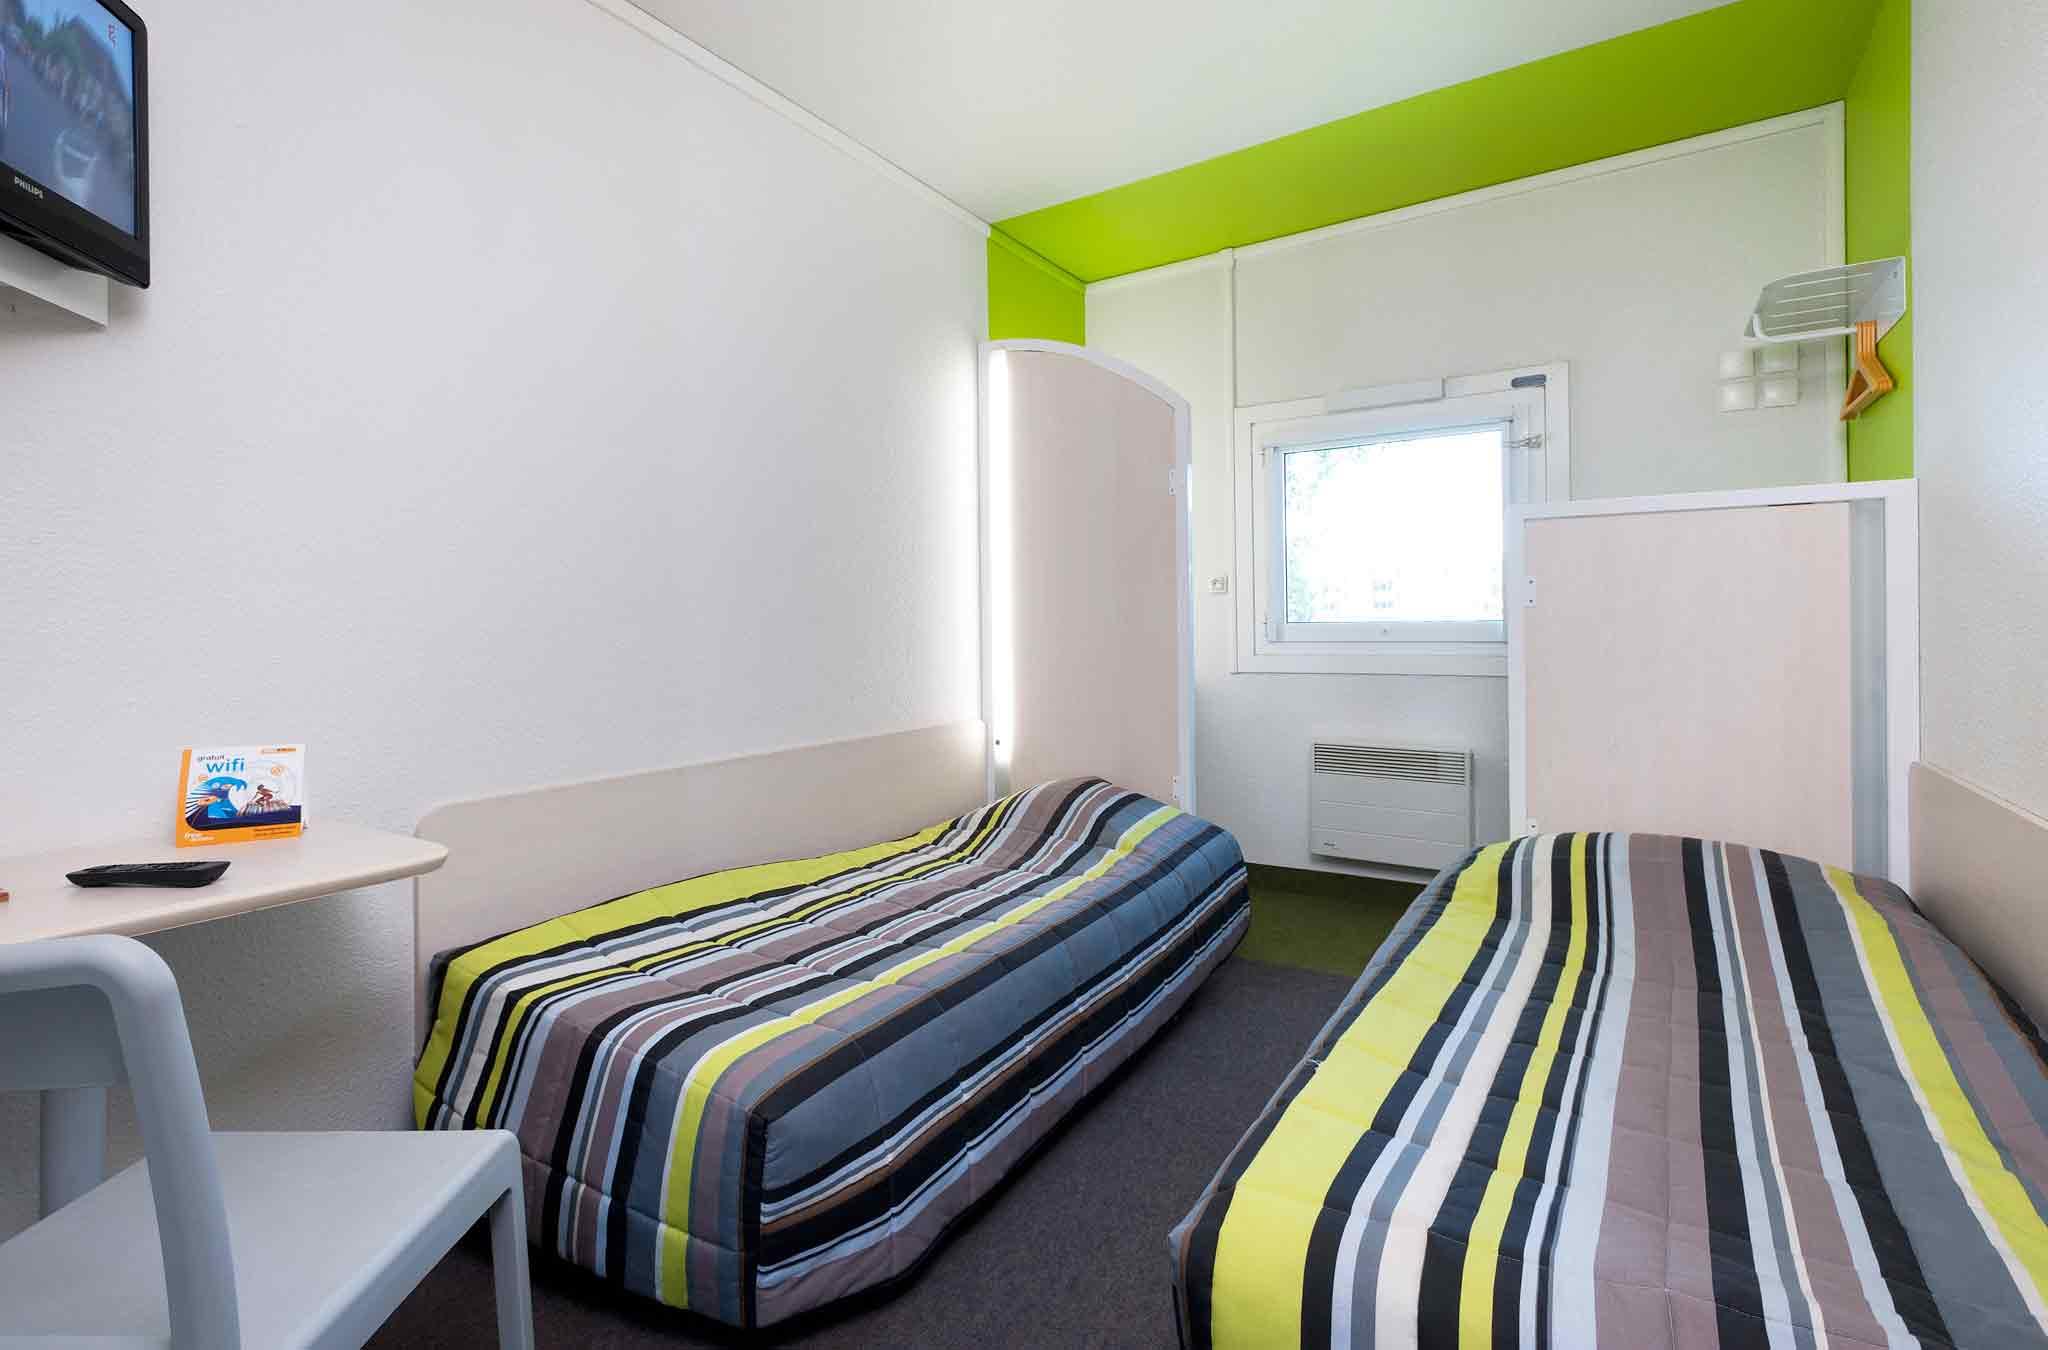 Hotel – hotelF1 Troyes Sud Parc Saint-Thibault